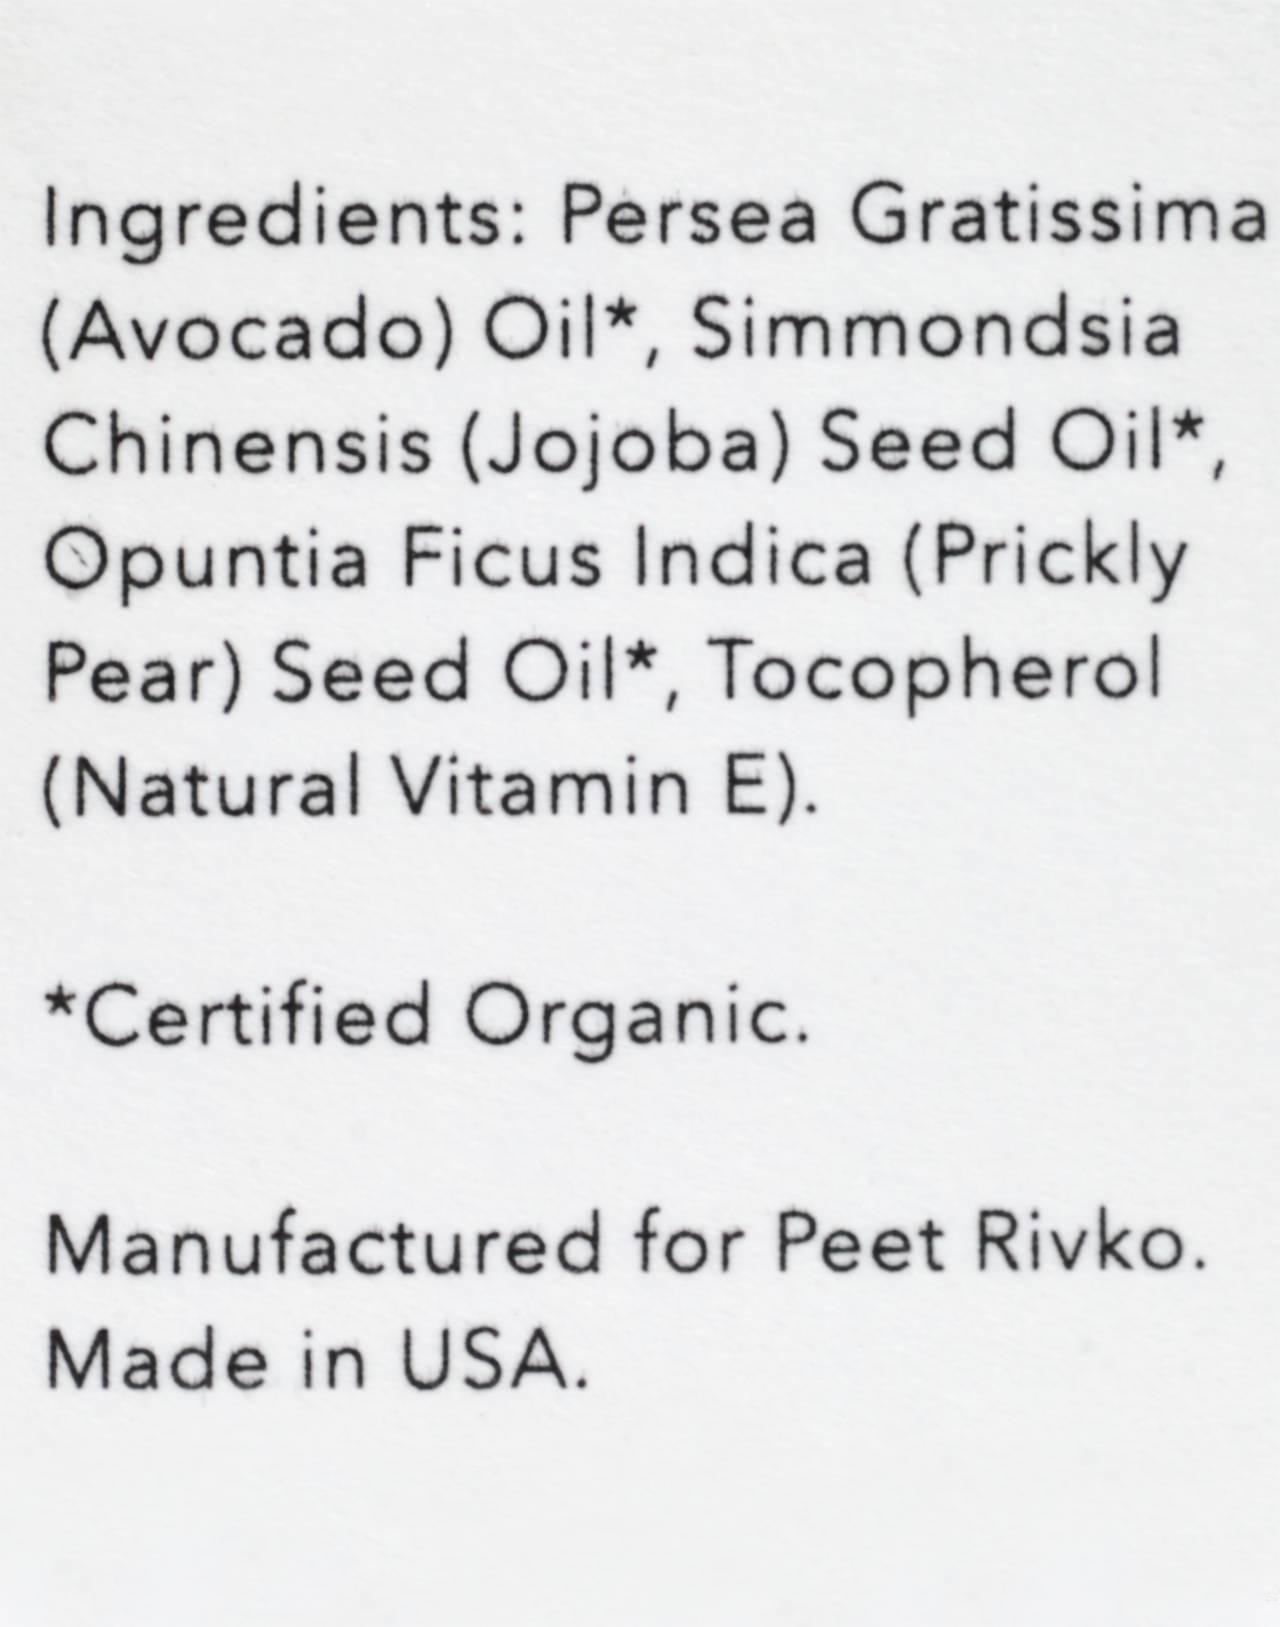 Peet Rivko® Balancing Face Oil in oil image 2